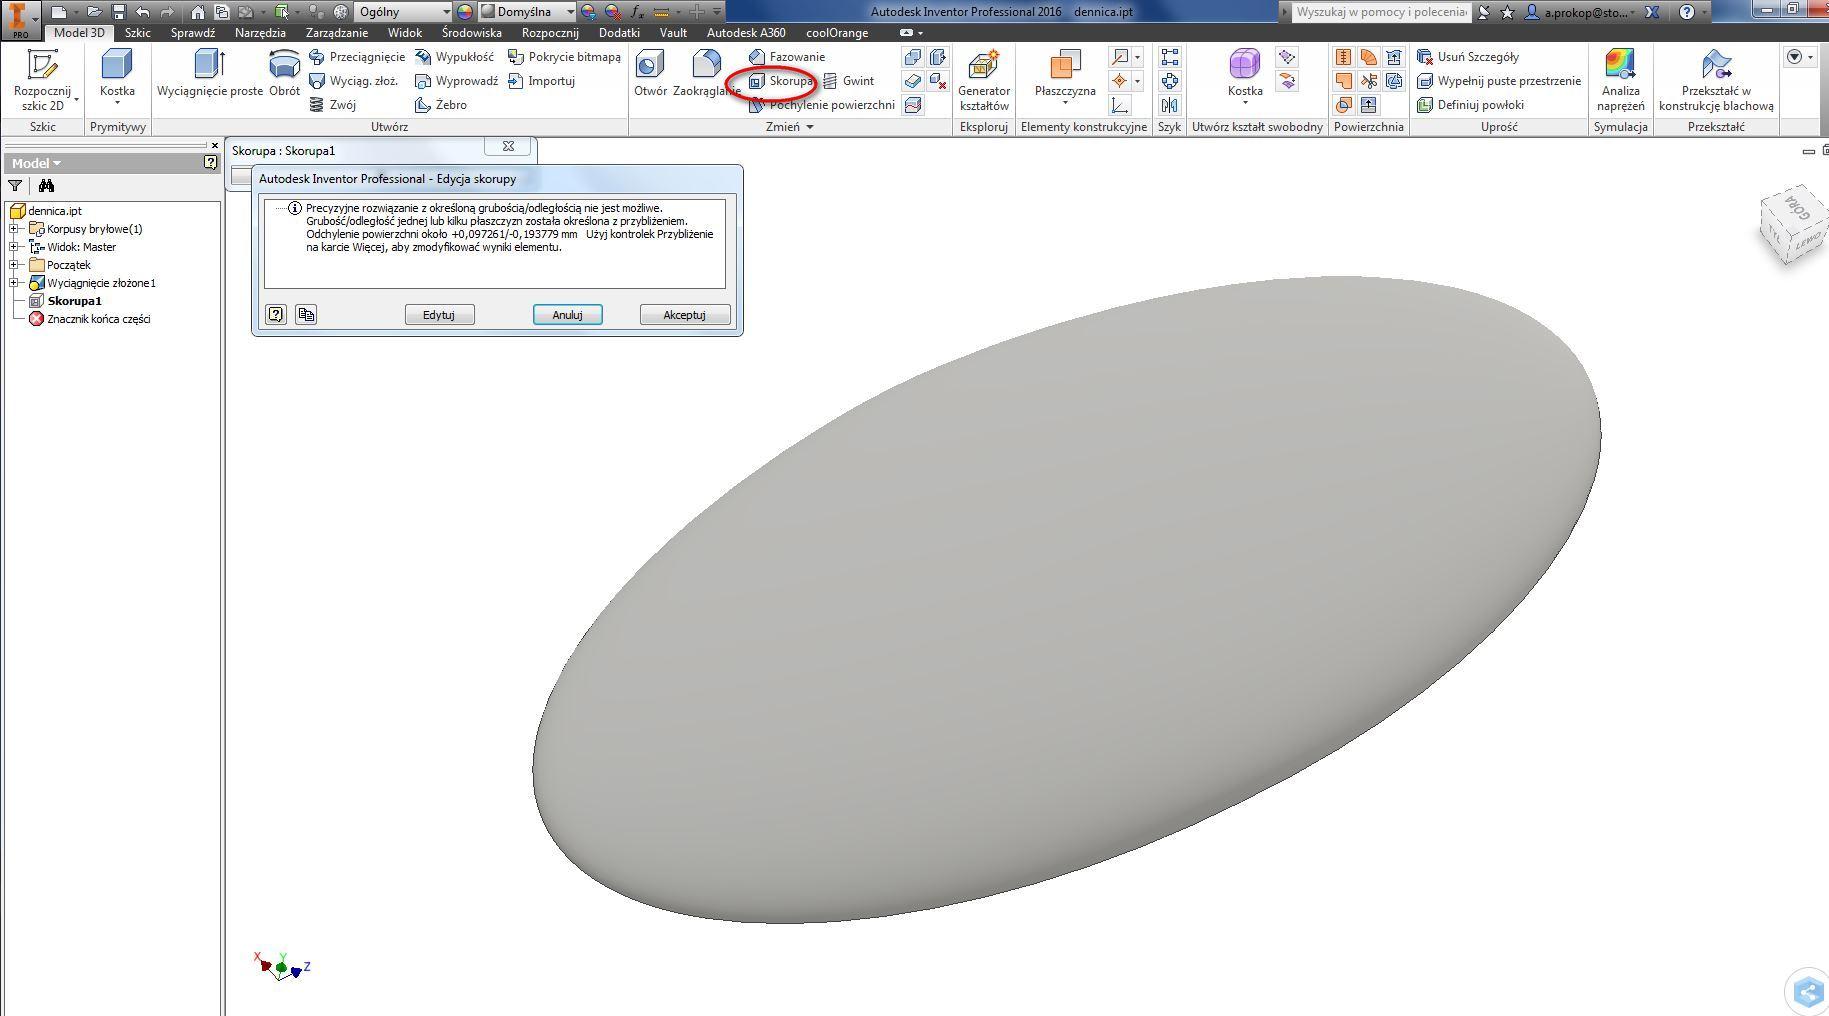 Elliptical ends - Autodesk Community- Inventor